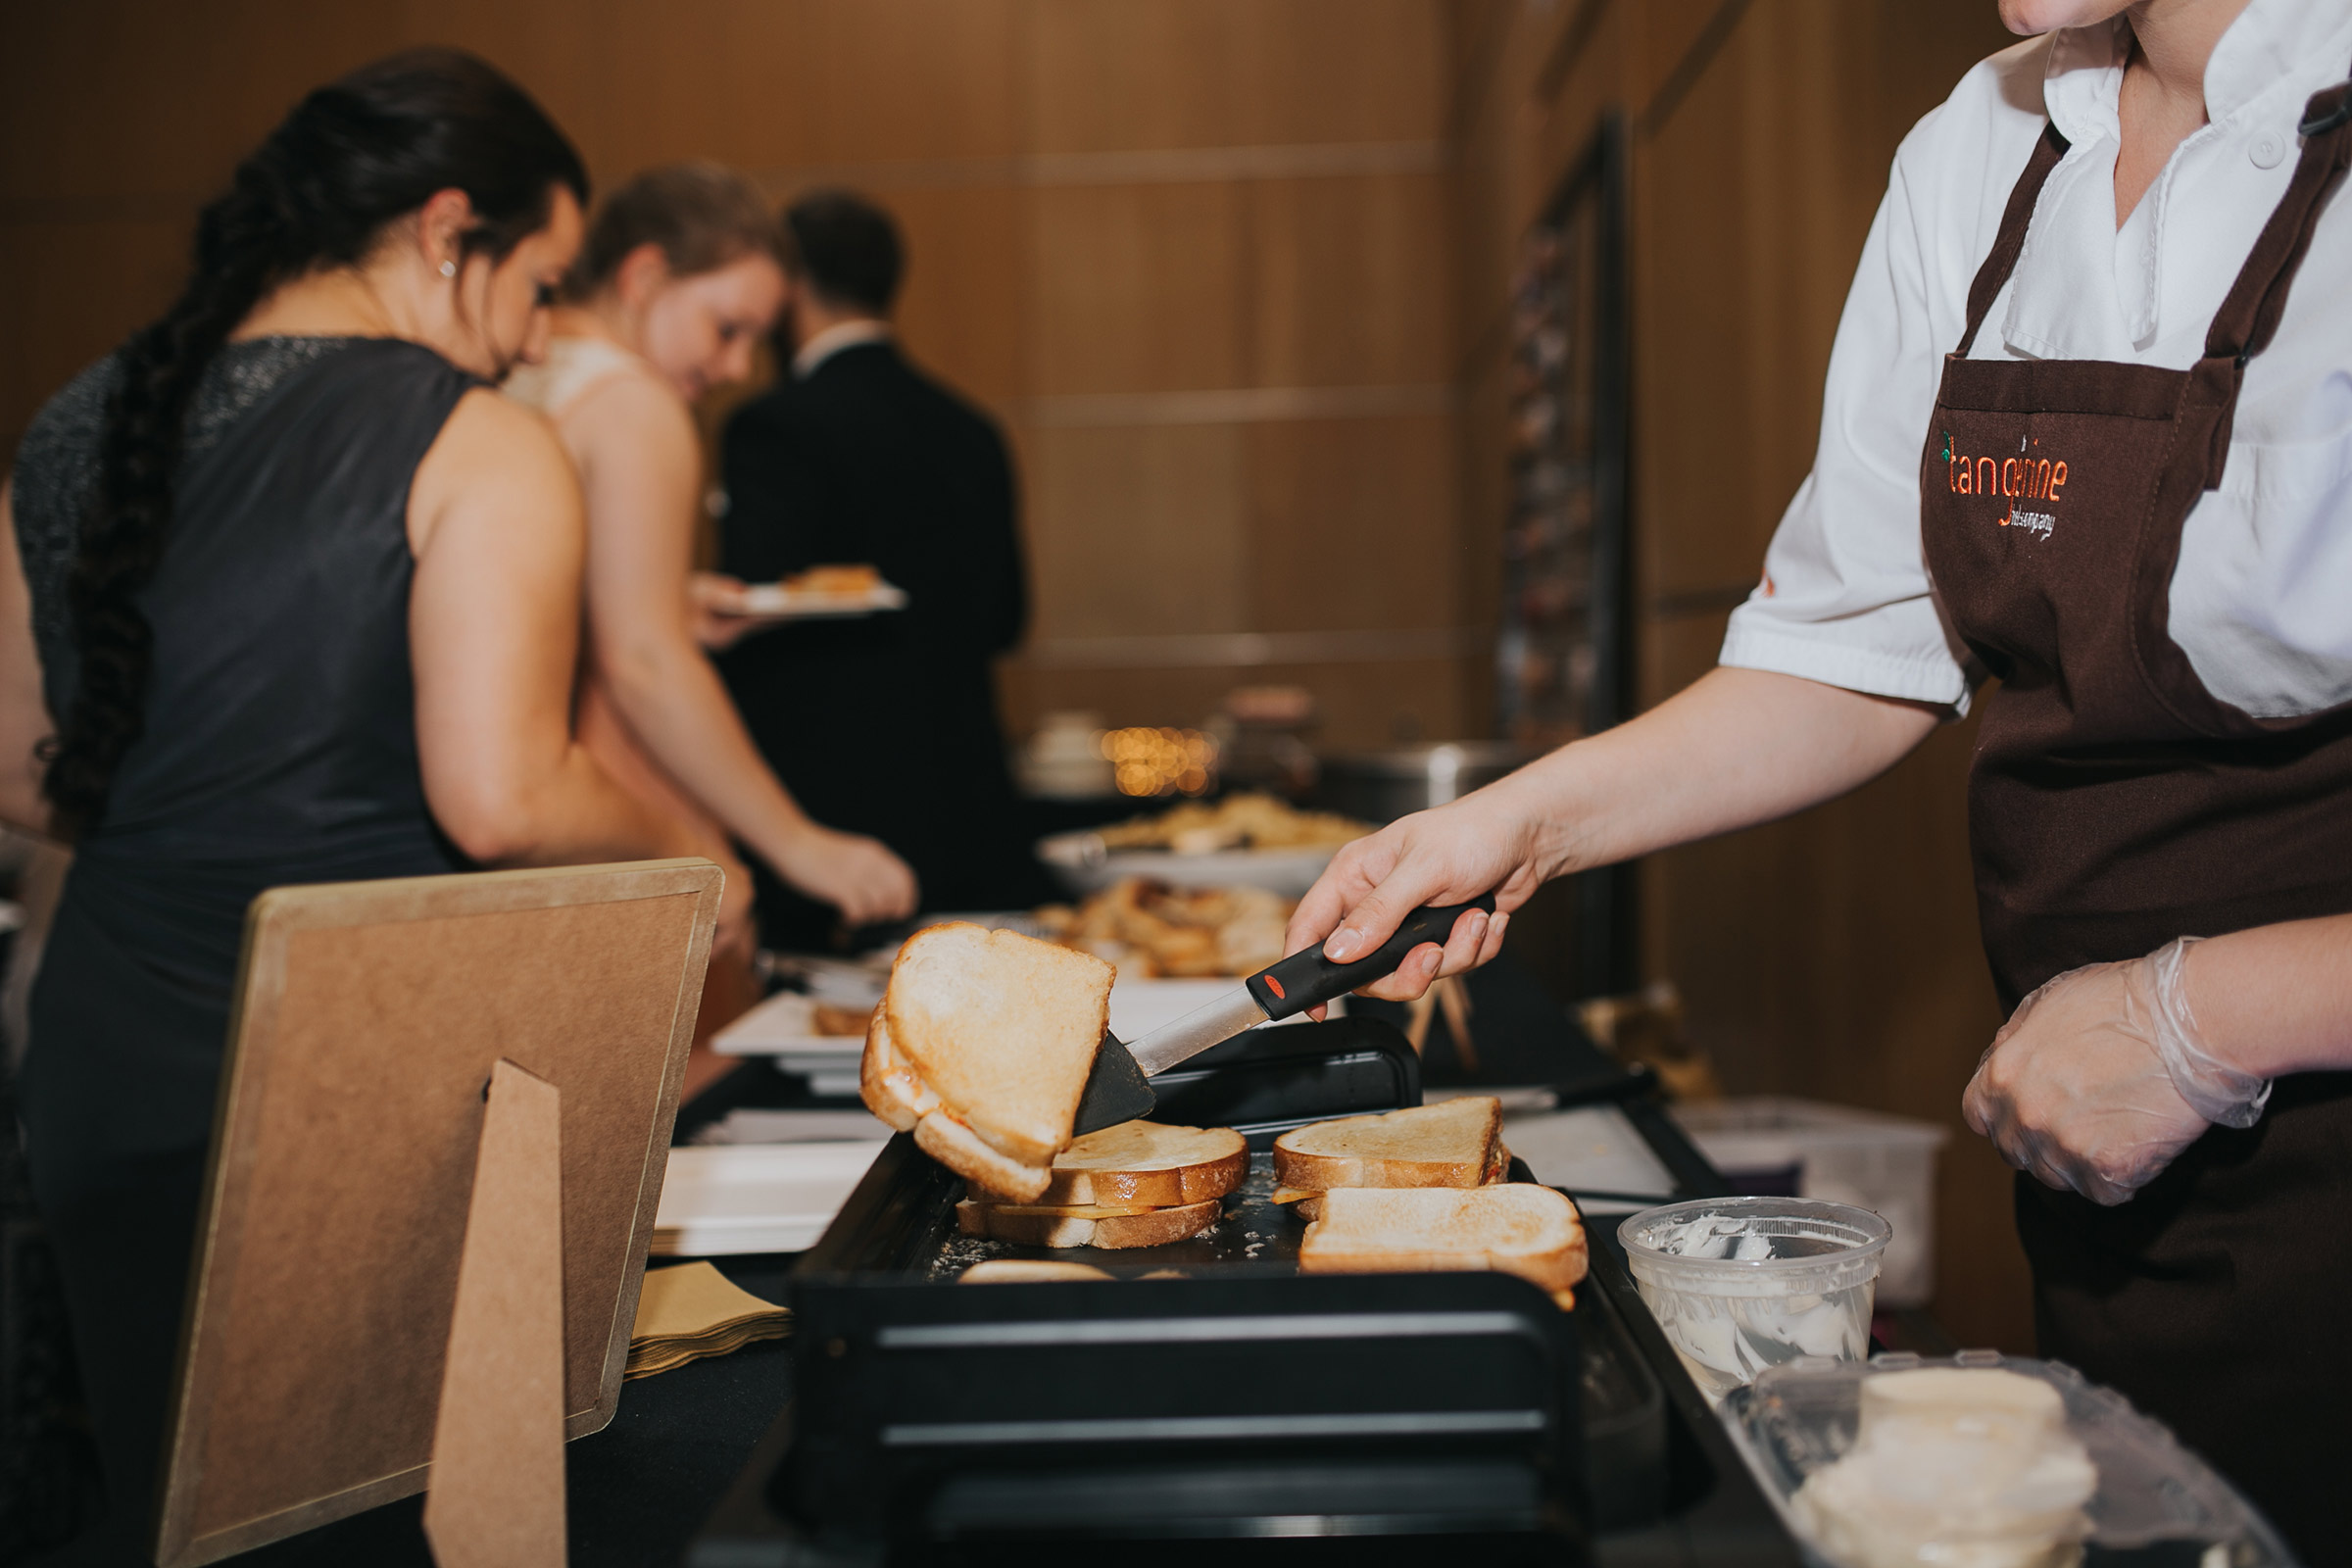 tangerine-catering-company-wedding-buffet-desmoines-iowa-art-center-raelyn-ramey-photography.jpg